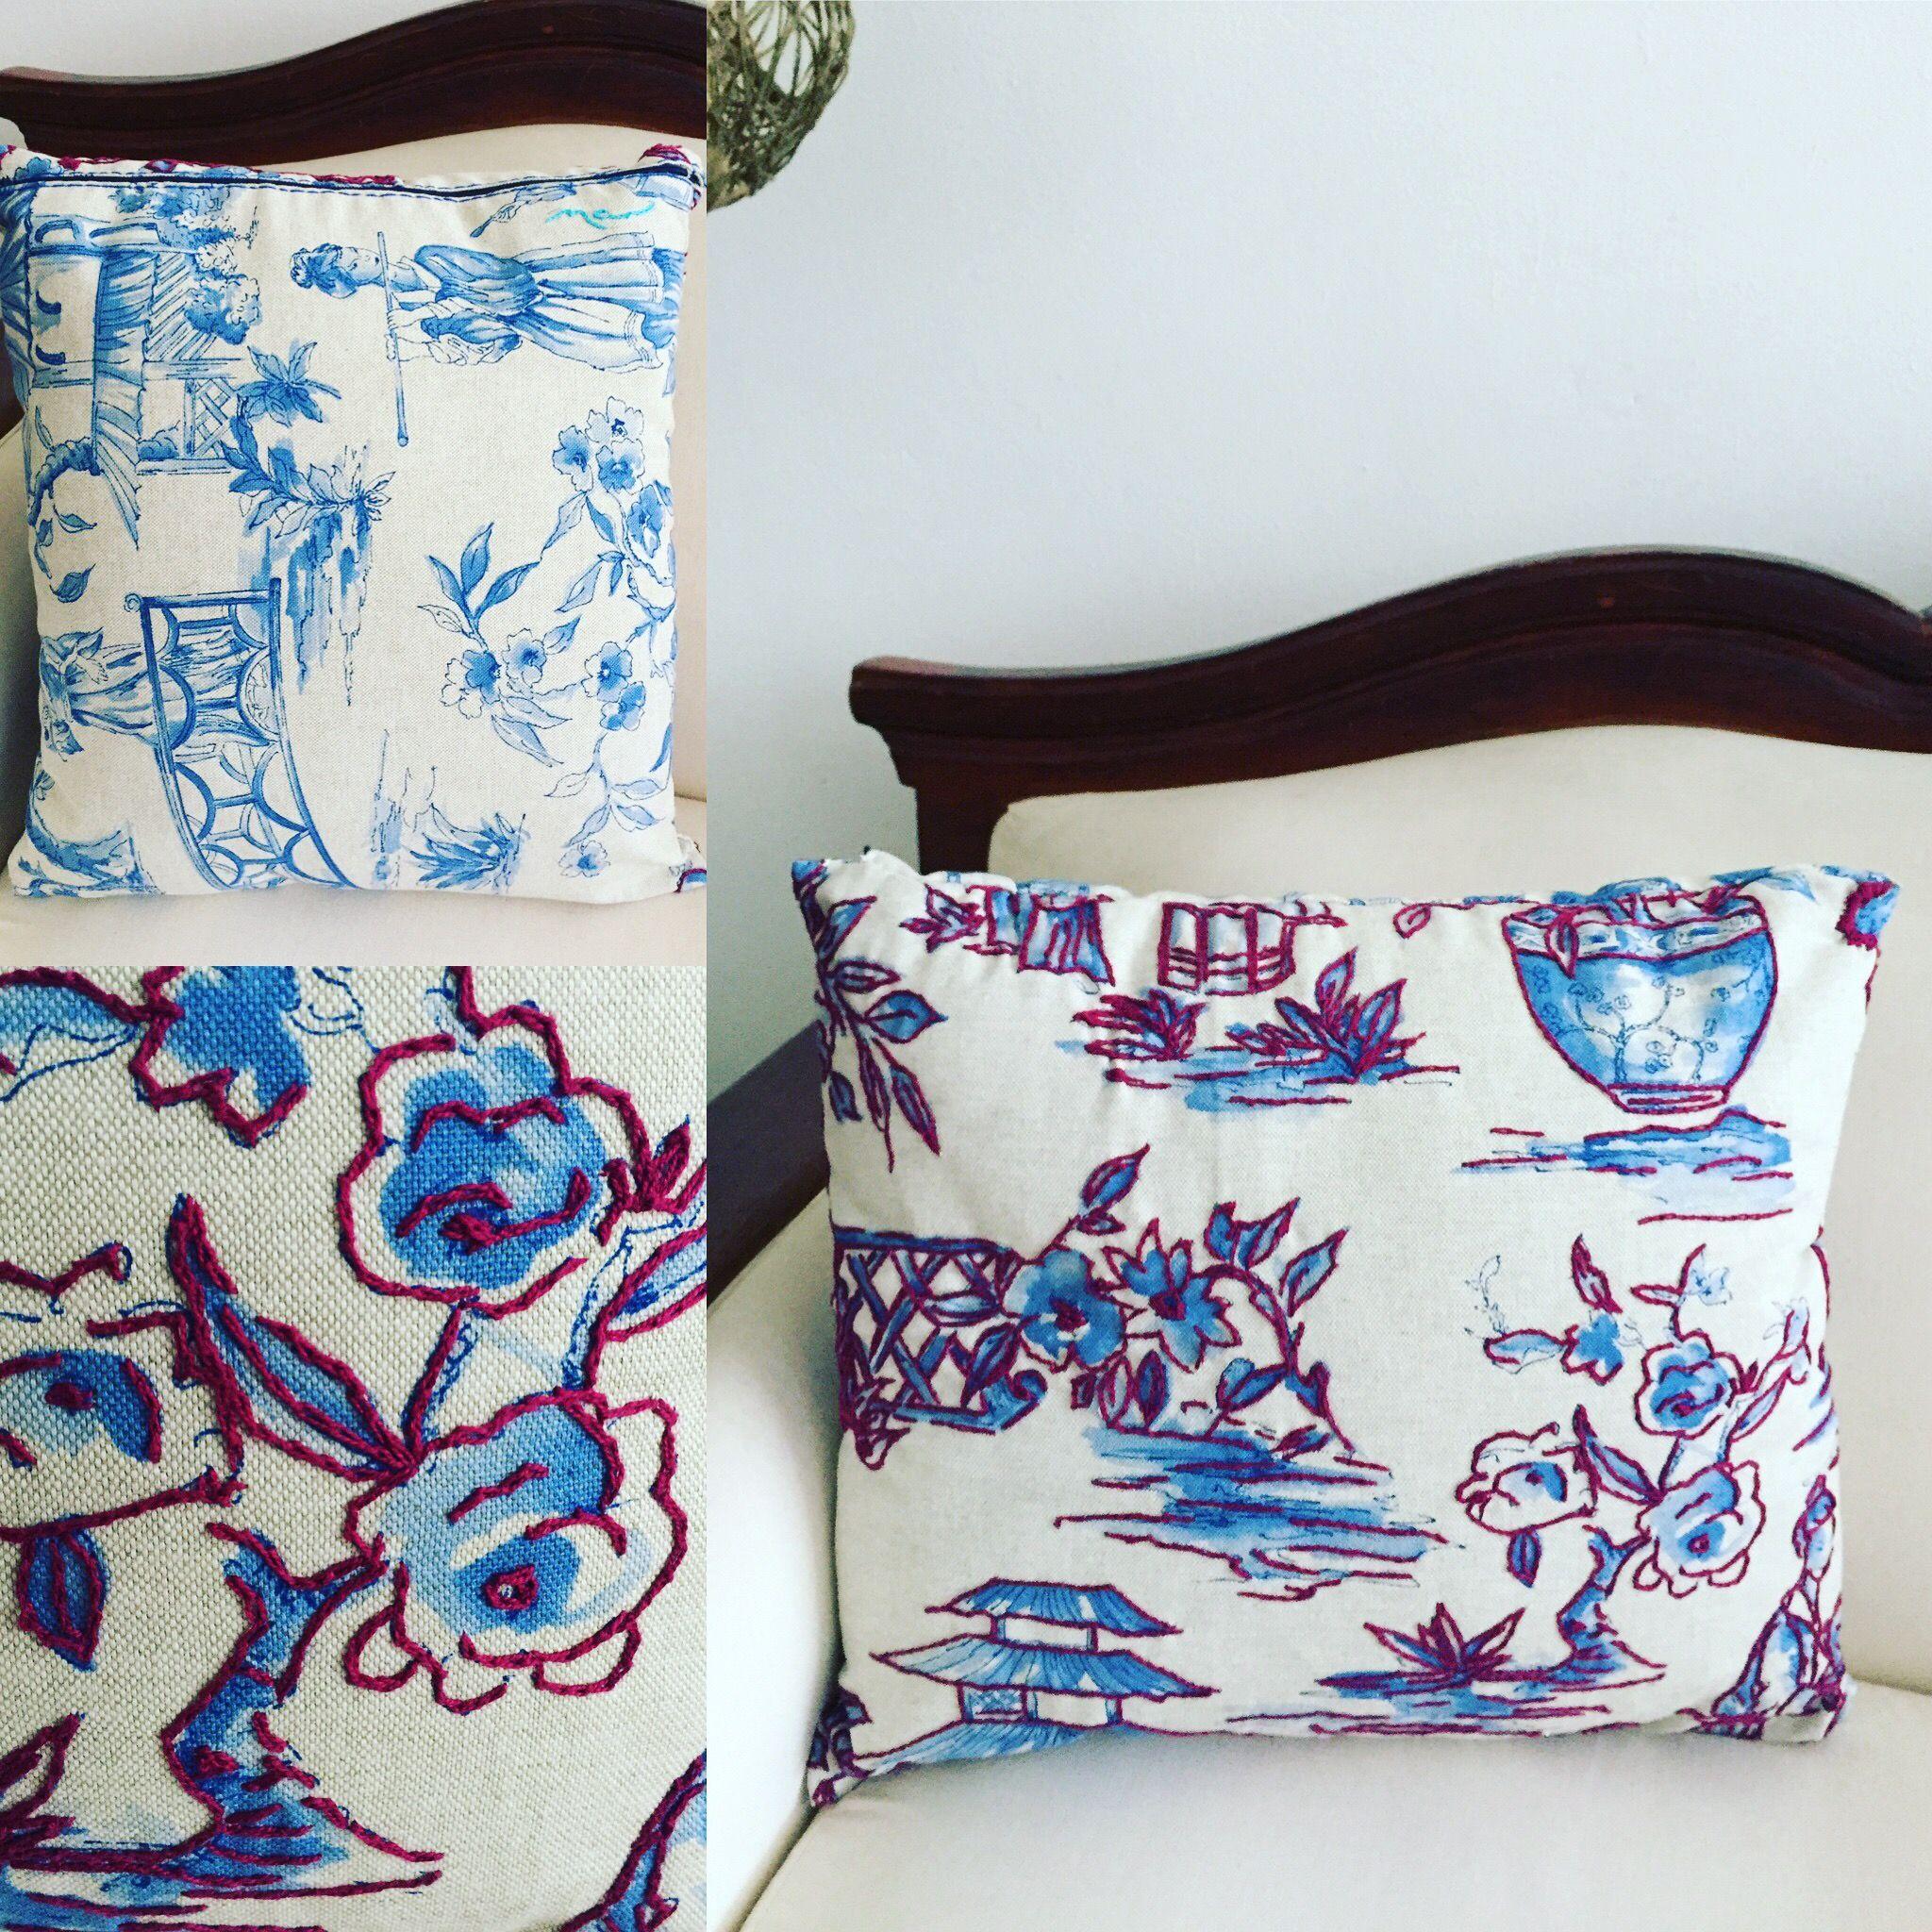 "China Pillow 45cmx40cm/ 17""x15"" Handmade Pillows by Mar 🛋🛋 Cojines hechos a mano por Mar.  www.marlifeshop.com WhatsApp 📲 WhatsApp (507)62523992 #hechoamano #handmade #panama #panamacity #marlifeshop #decoradorespanama #onlineshop"